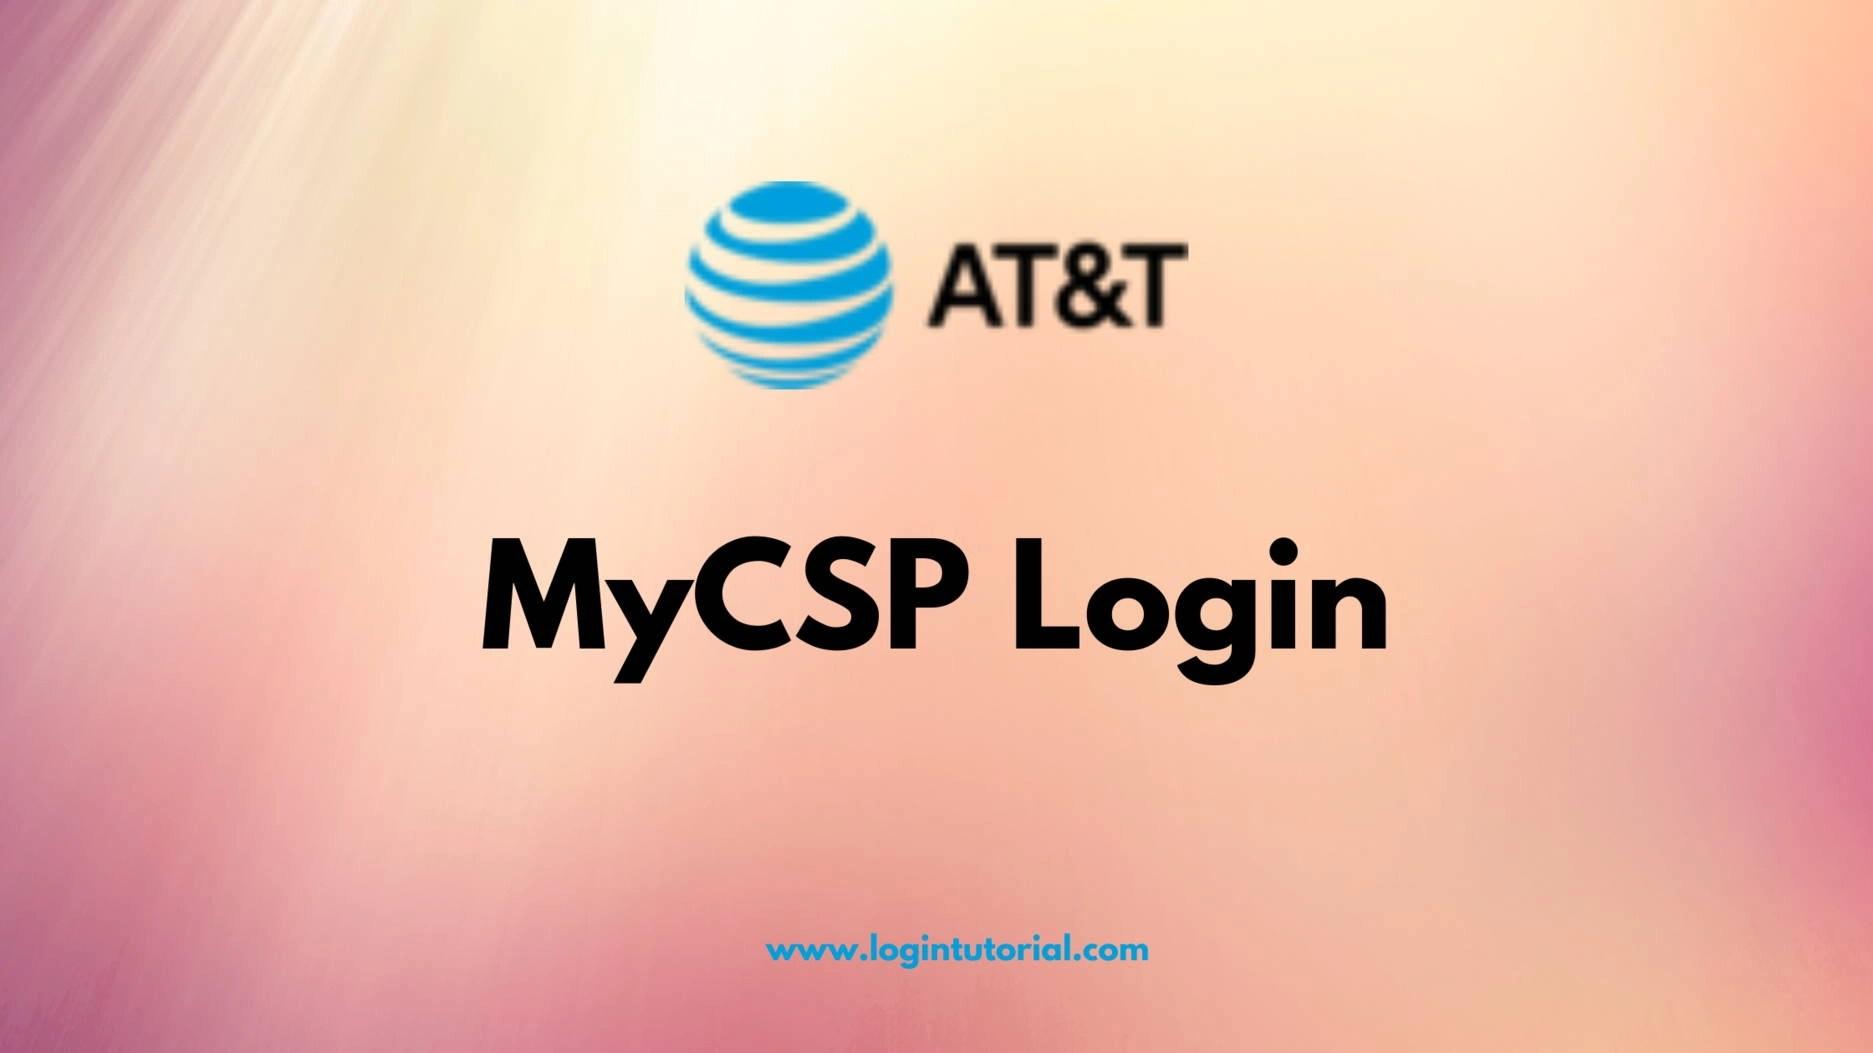 MyCSP AT&T Login steps